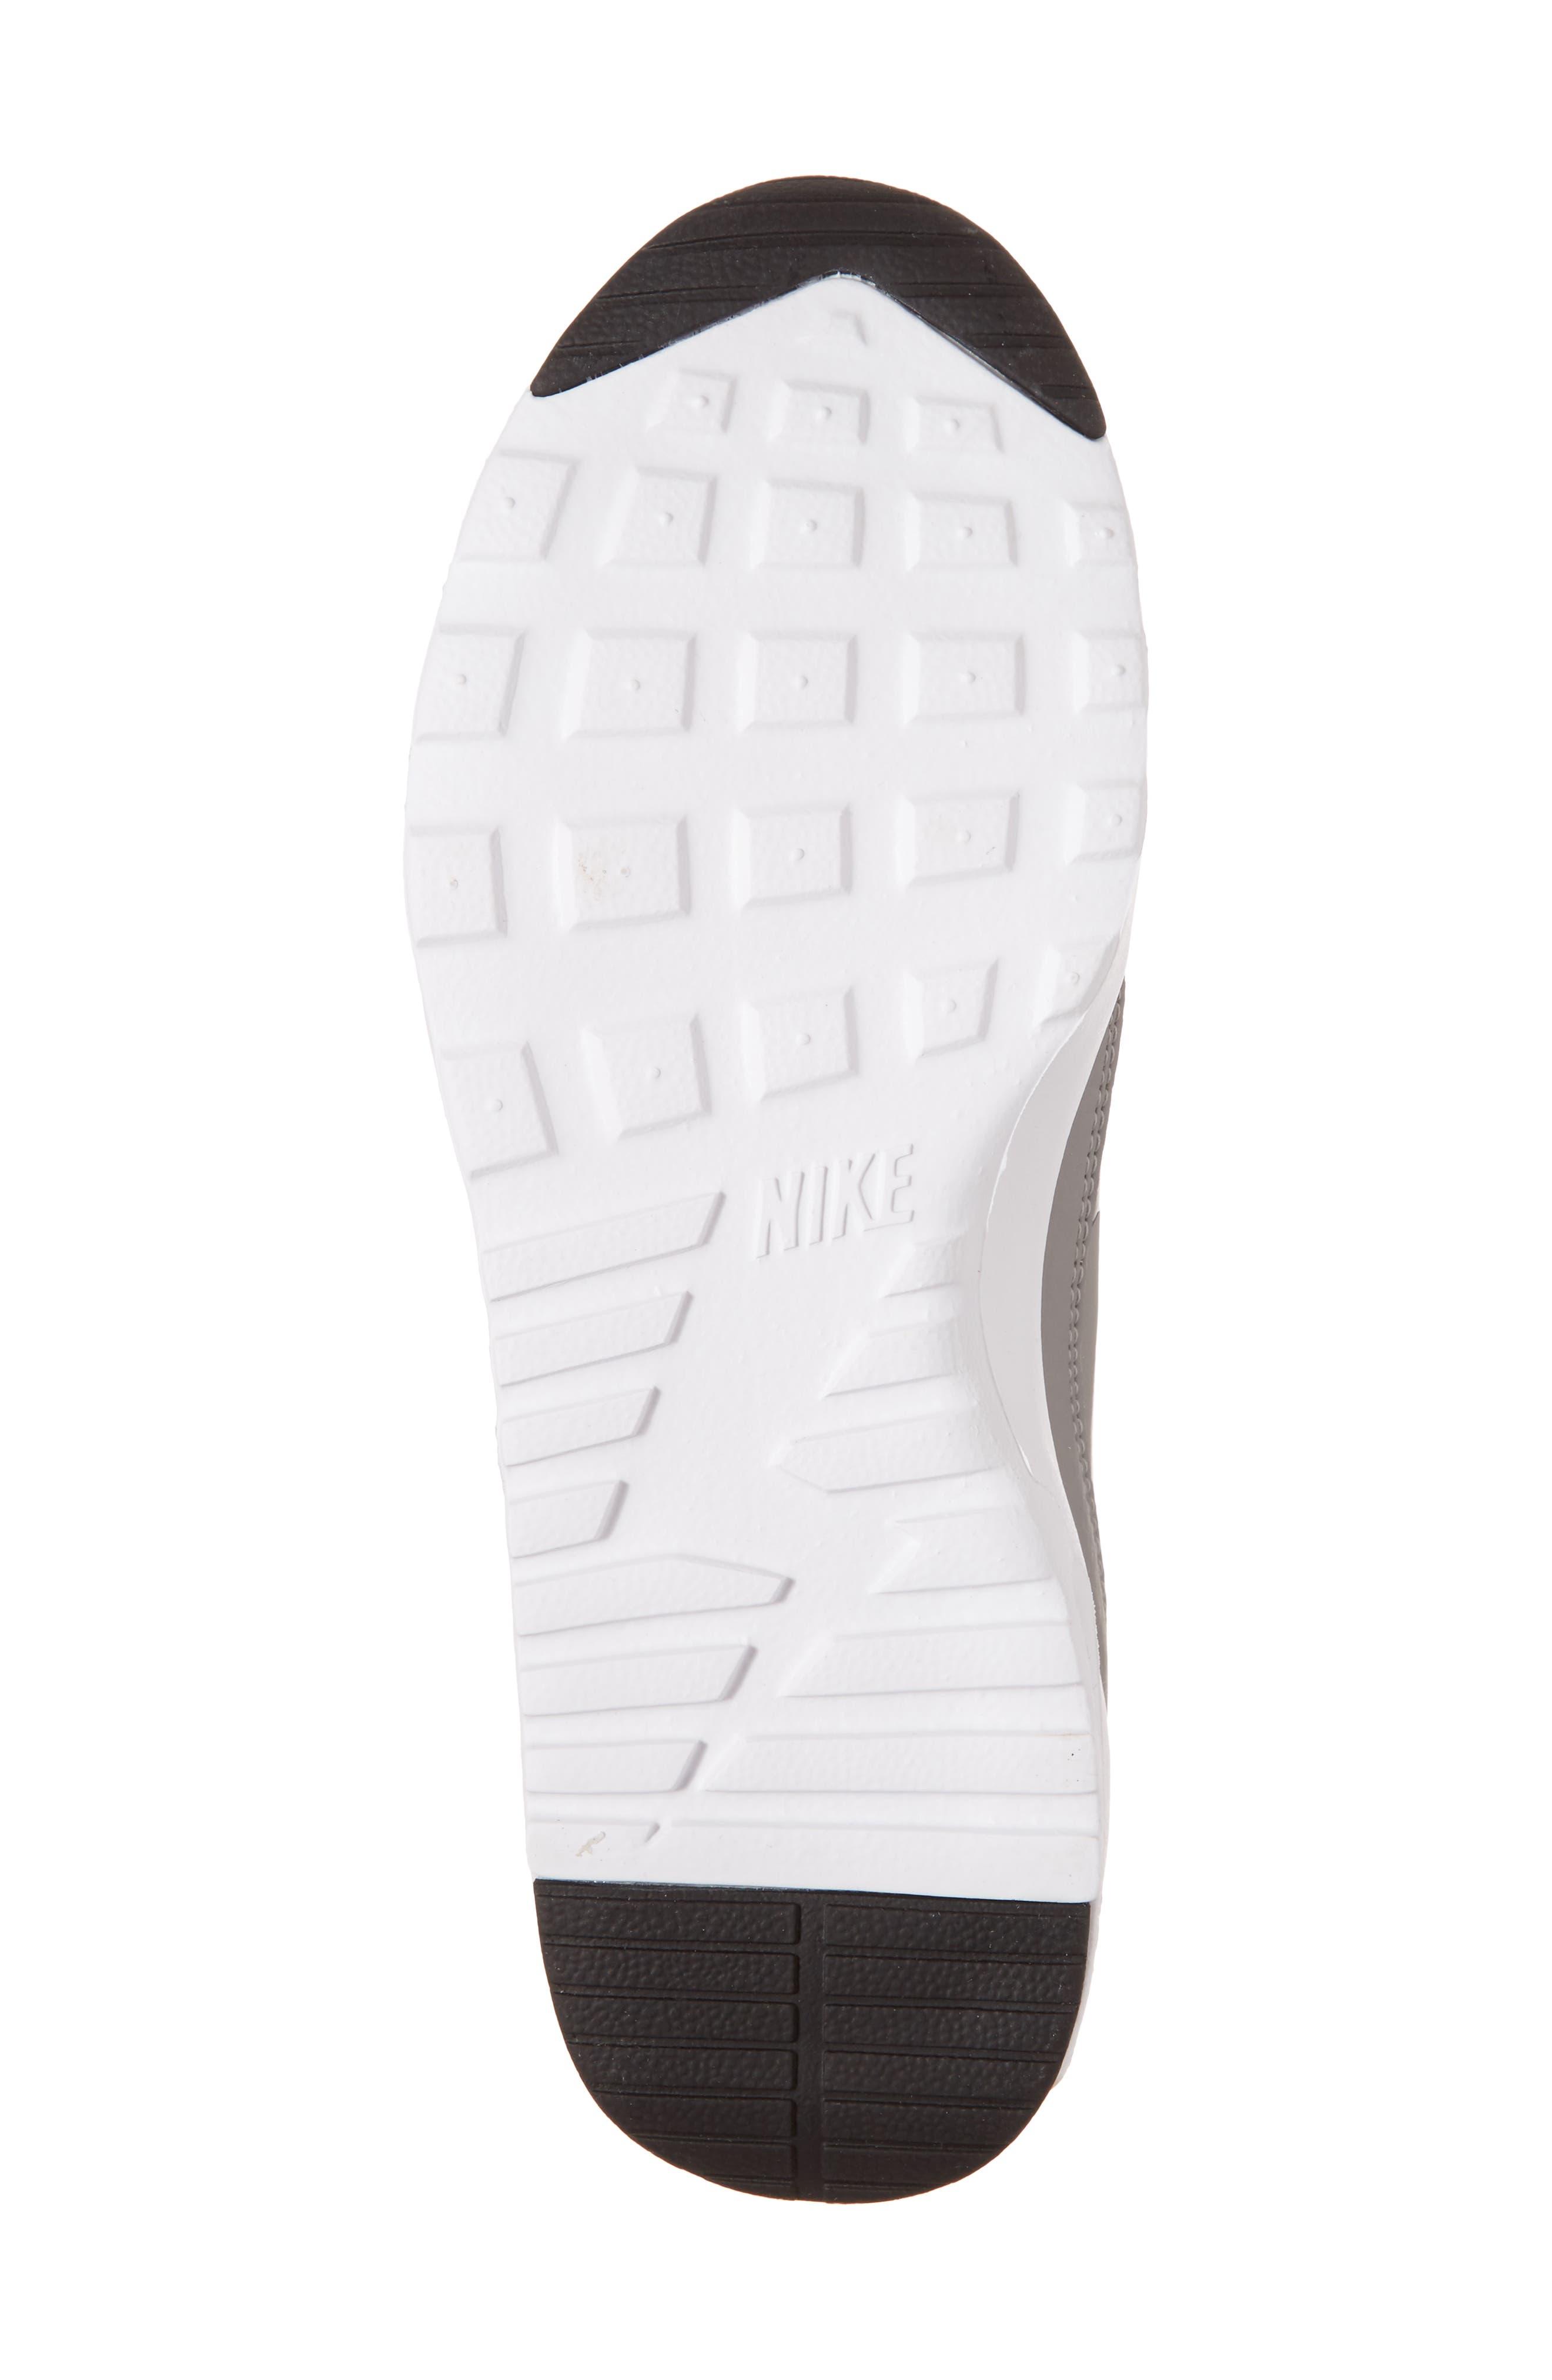 Air Max Thea Knit Sneaker,                             Alternate thumbnail 6, color,                             020